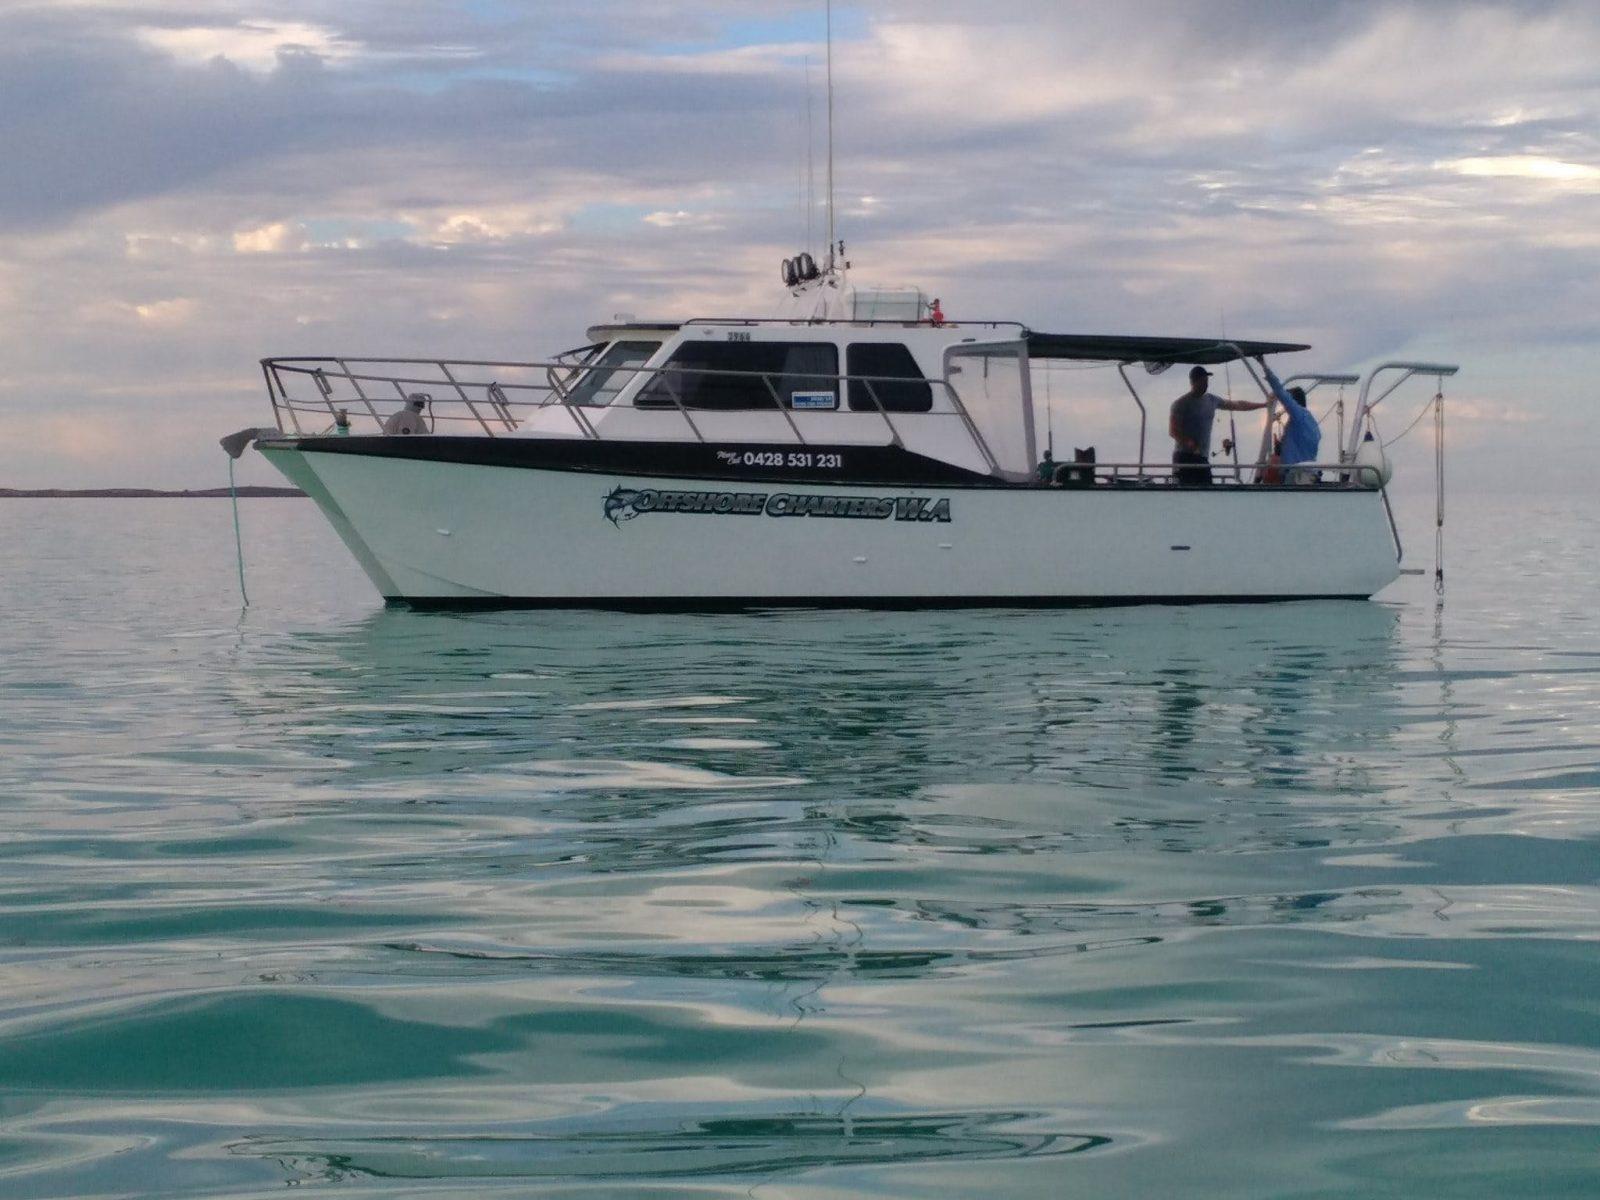 Offshore Charters WA, Beresford, Western Australia